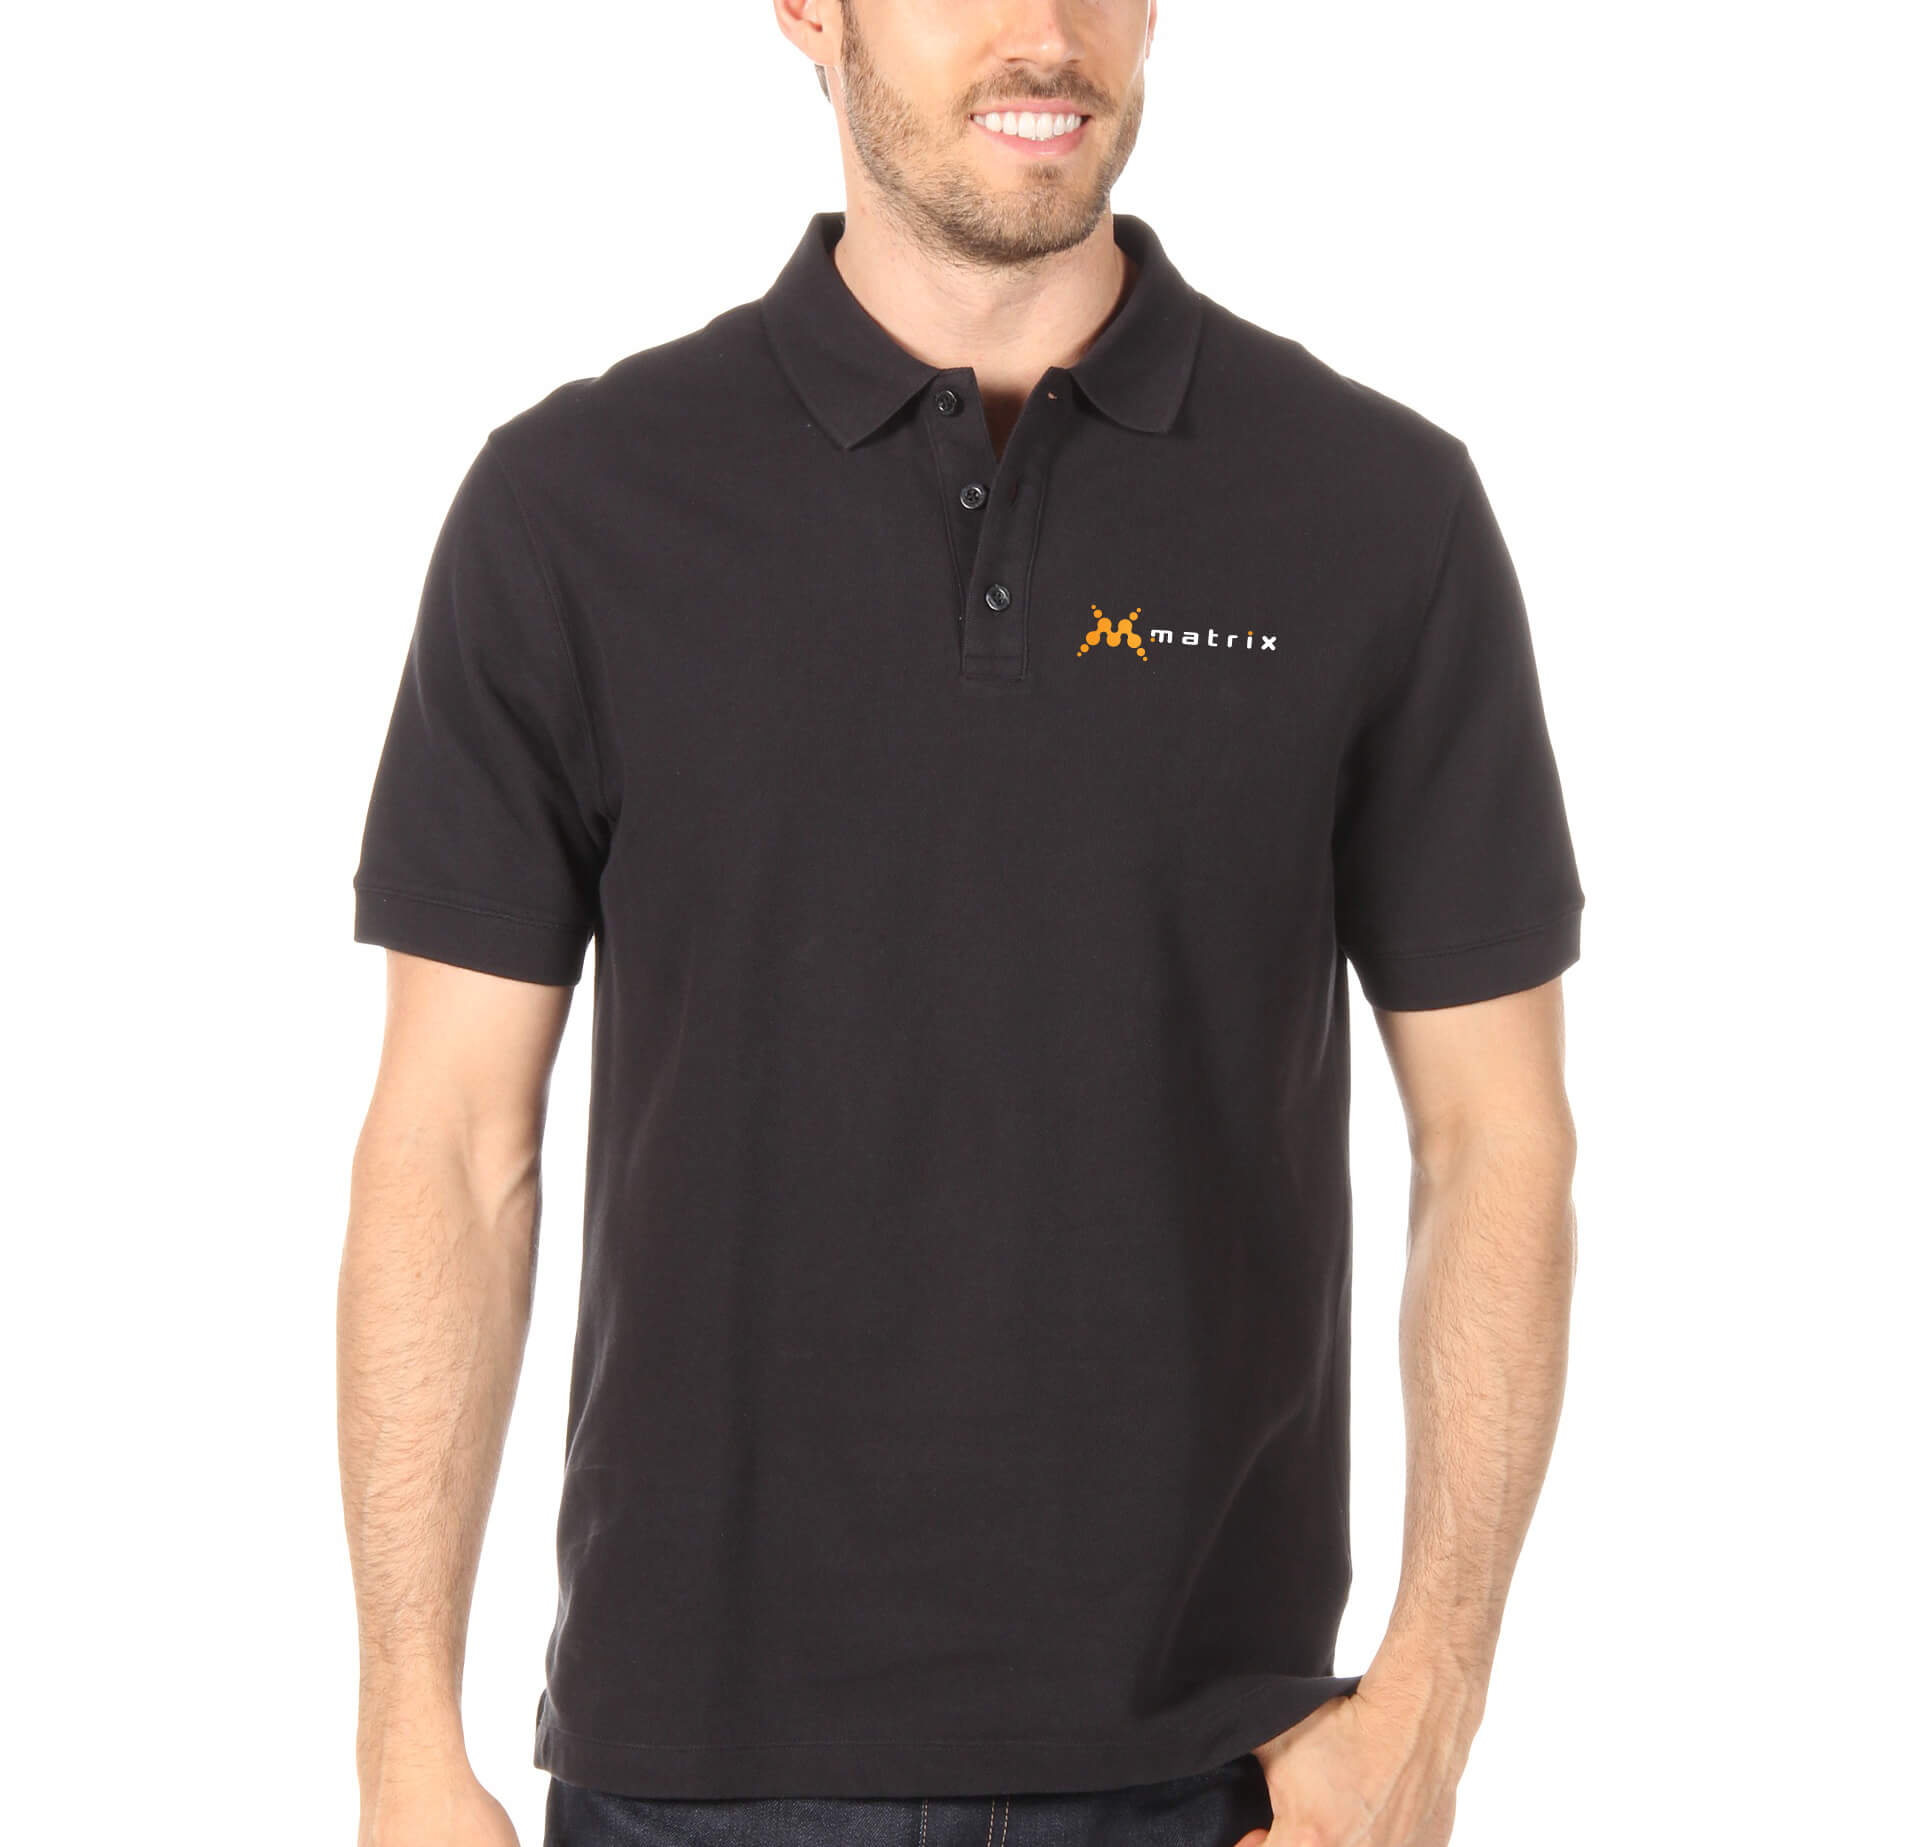 Matrix Polo Shirt